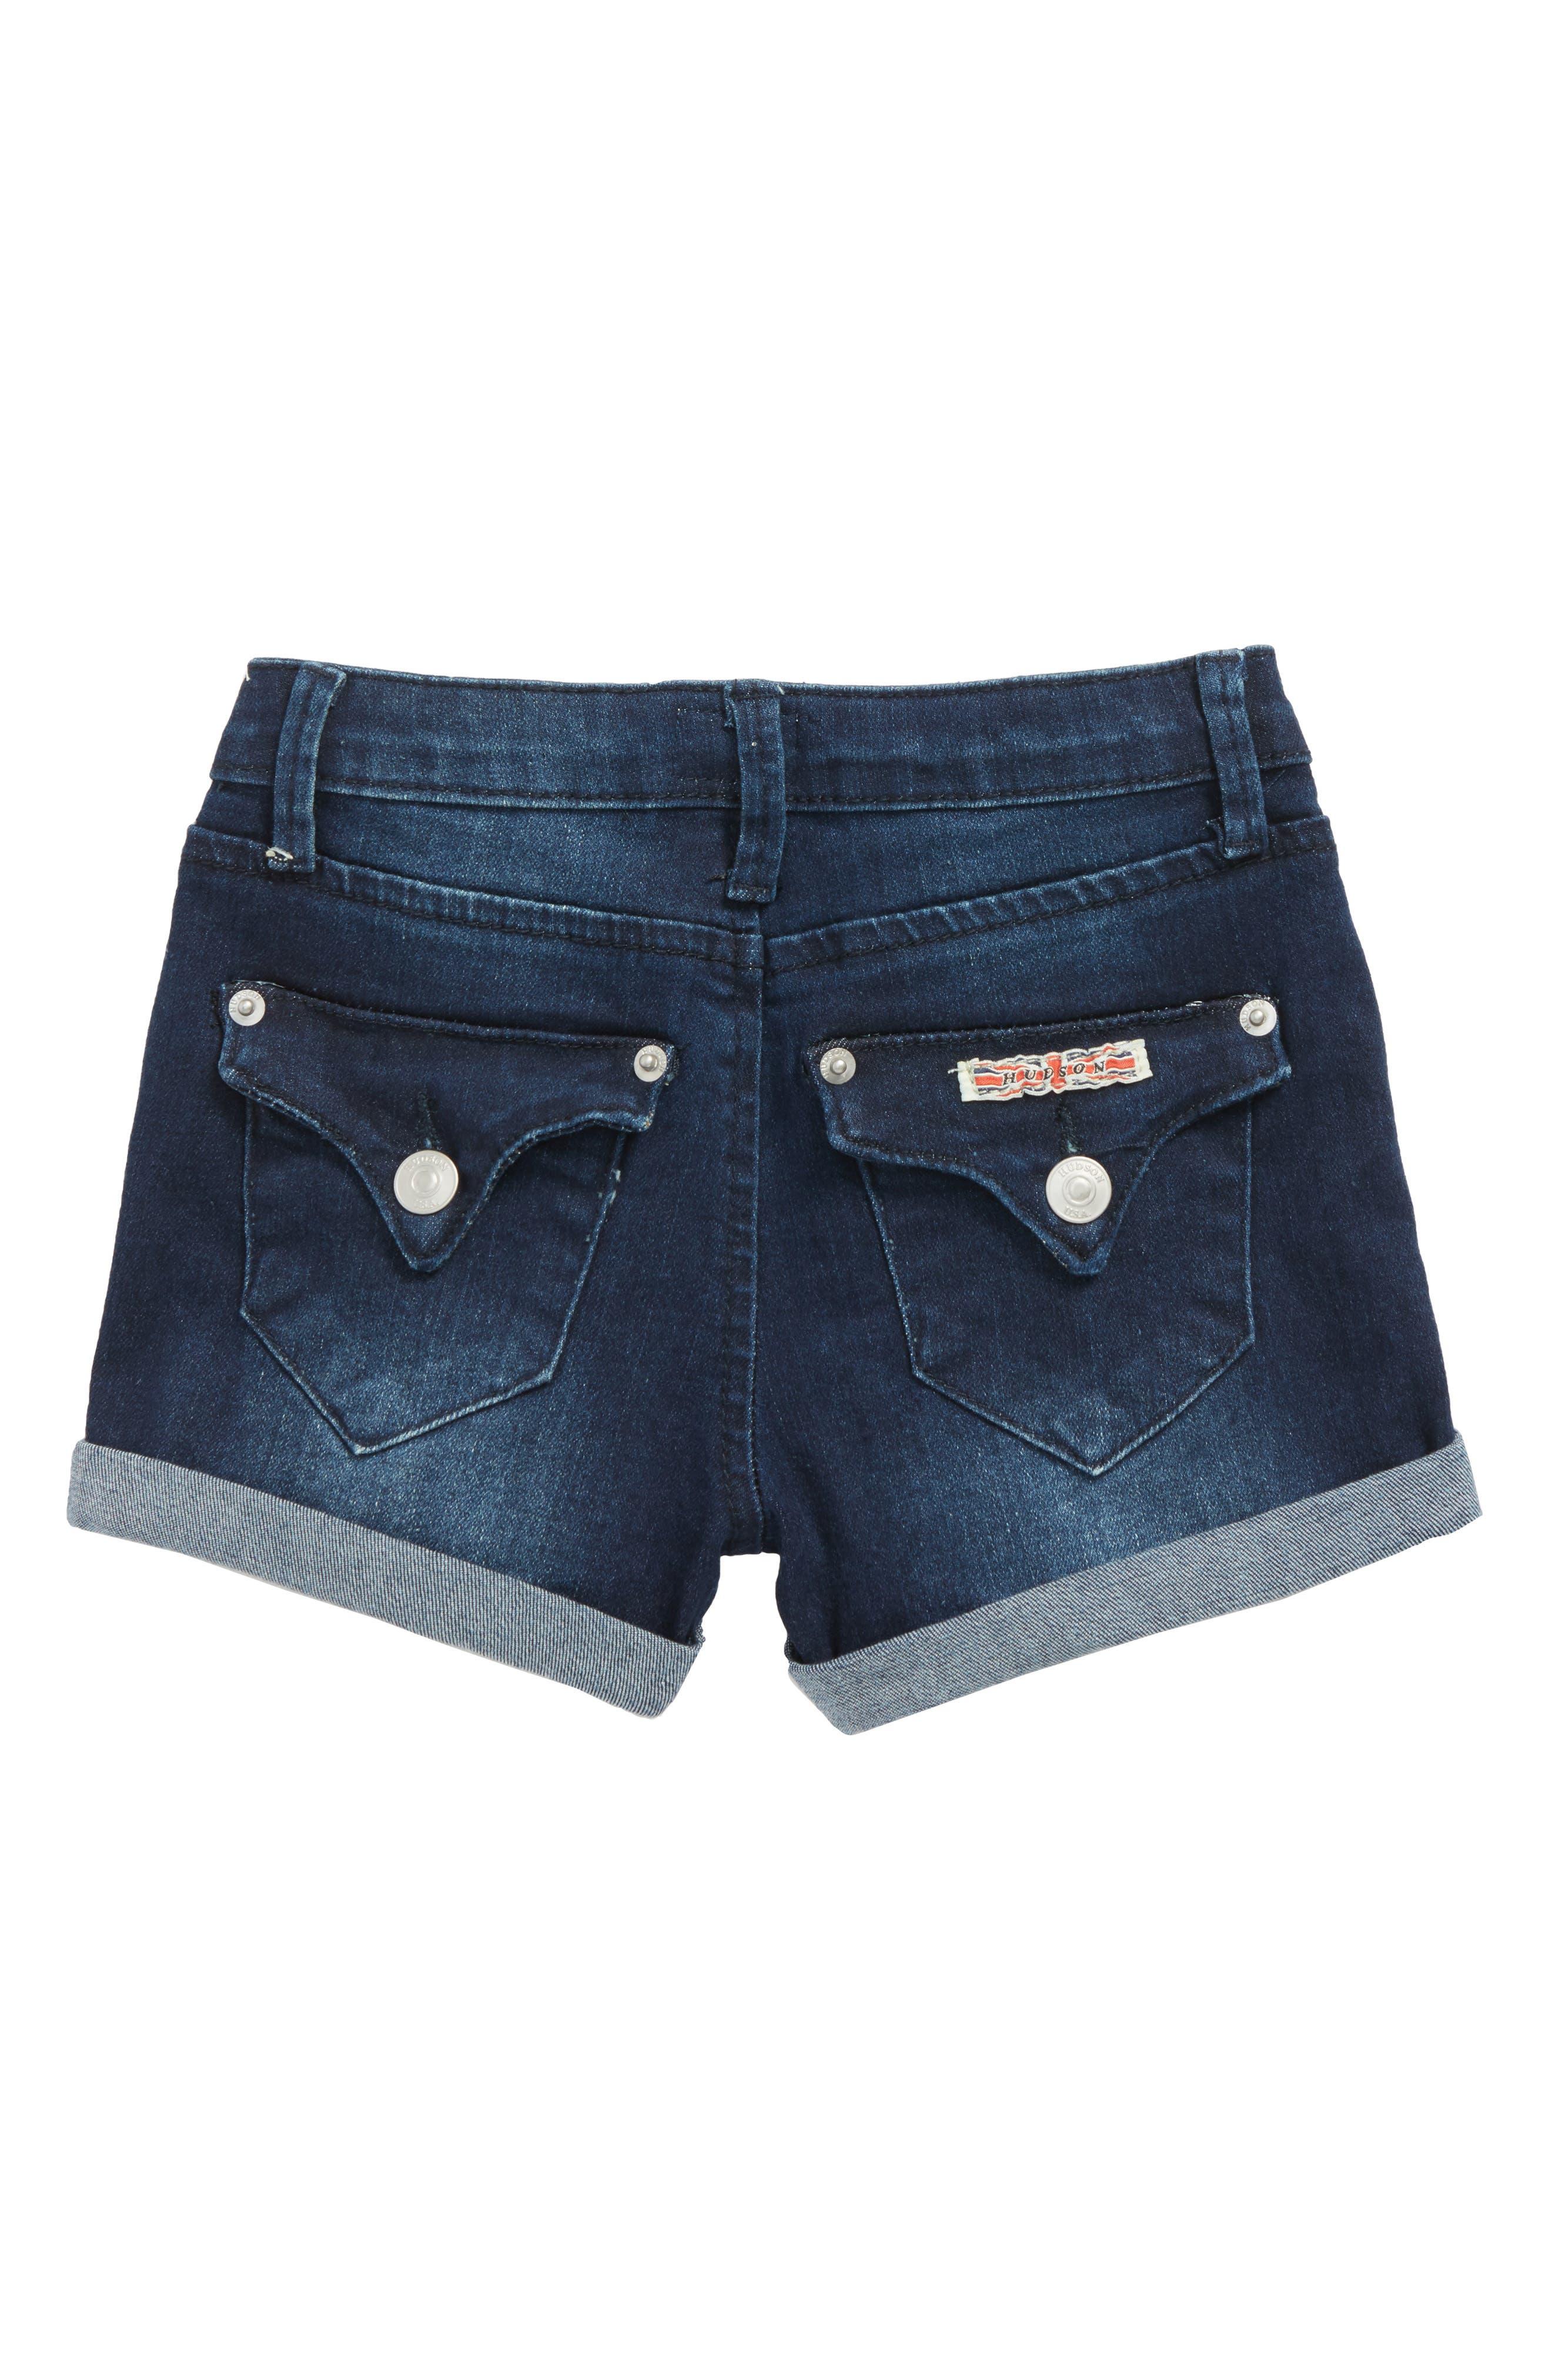 Roll Cuff Denim Shorts,                             Alternate thumbnail 2, color,                             Low Octane Blue